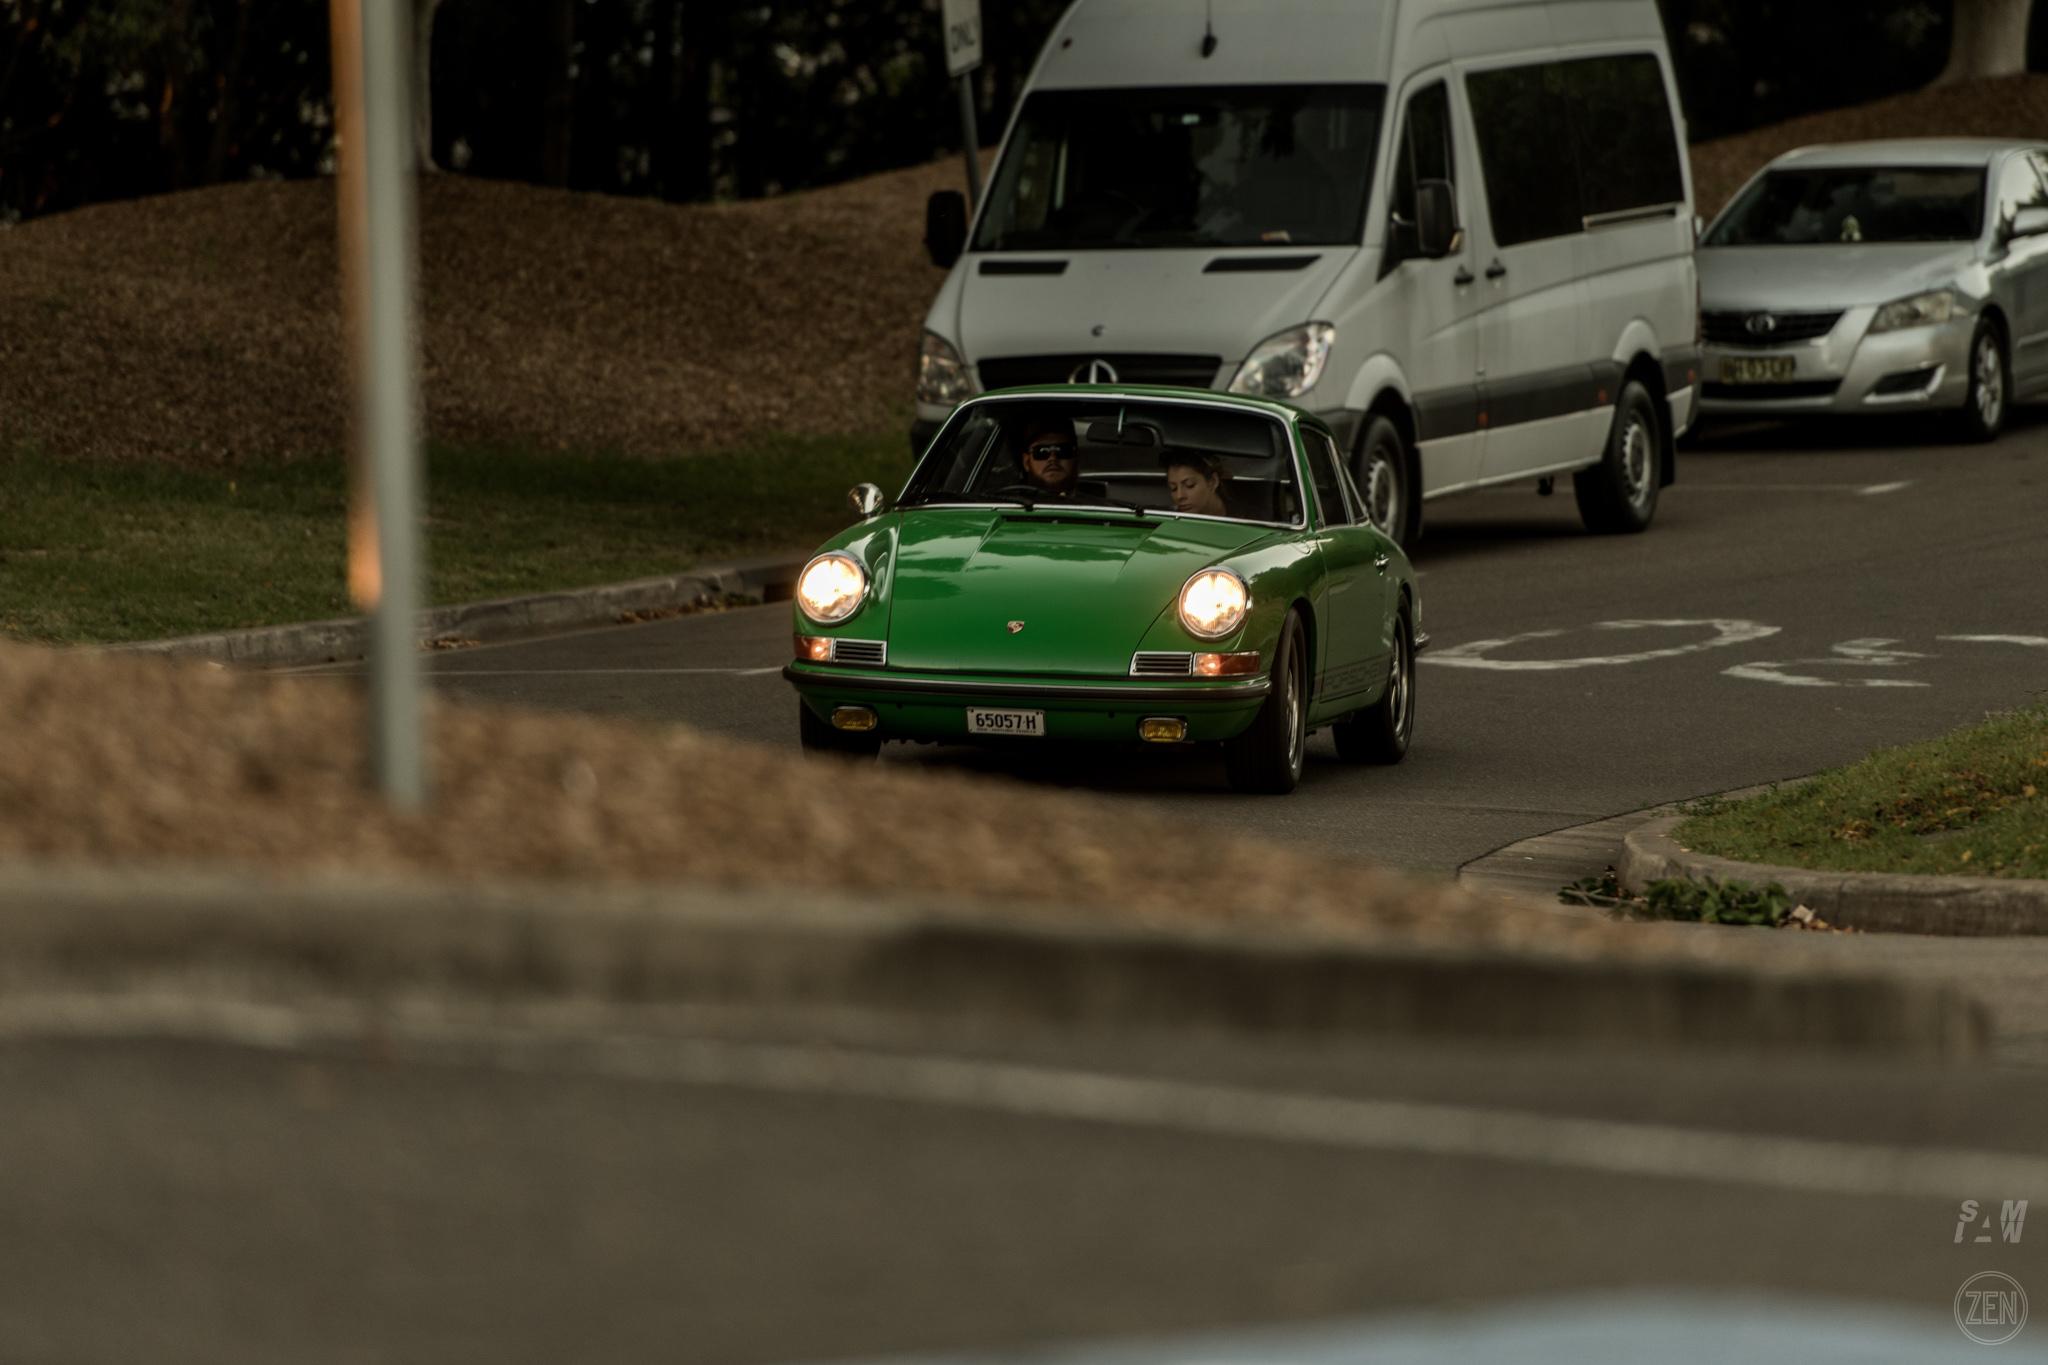 2019-10-27 - Autohaus Porsches & Coffee 006